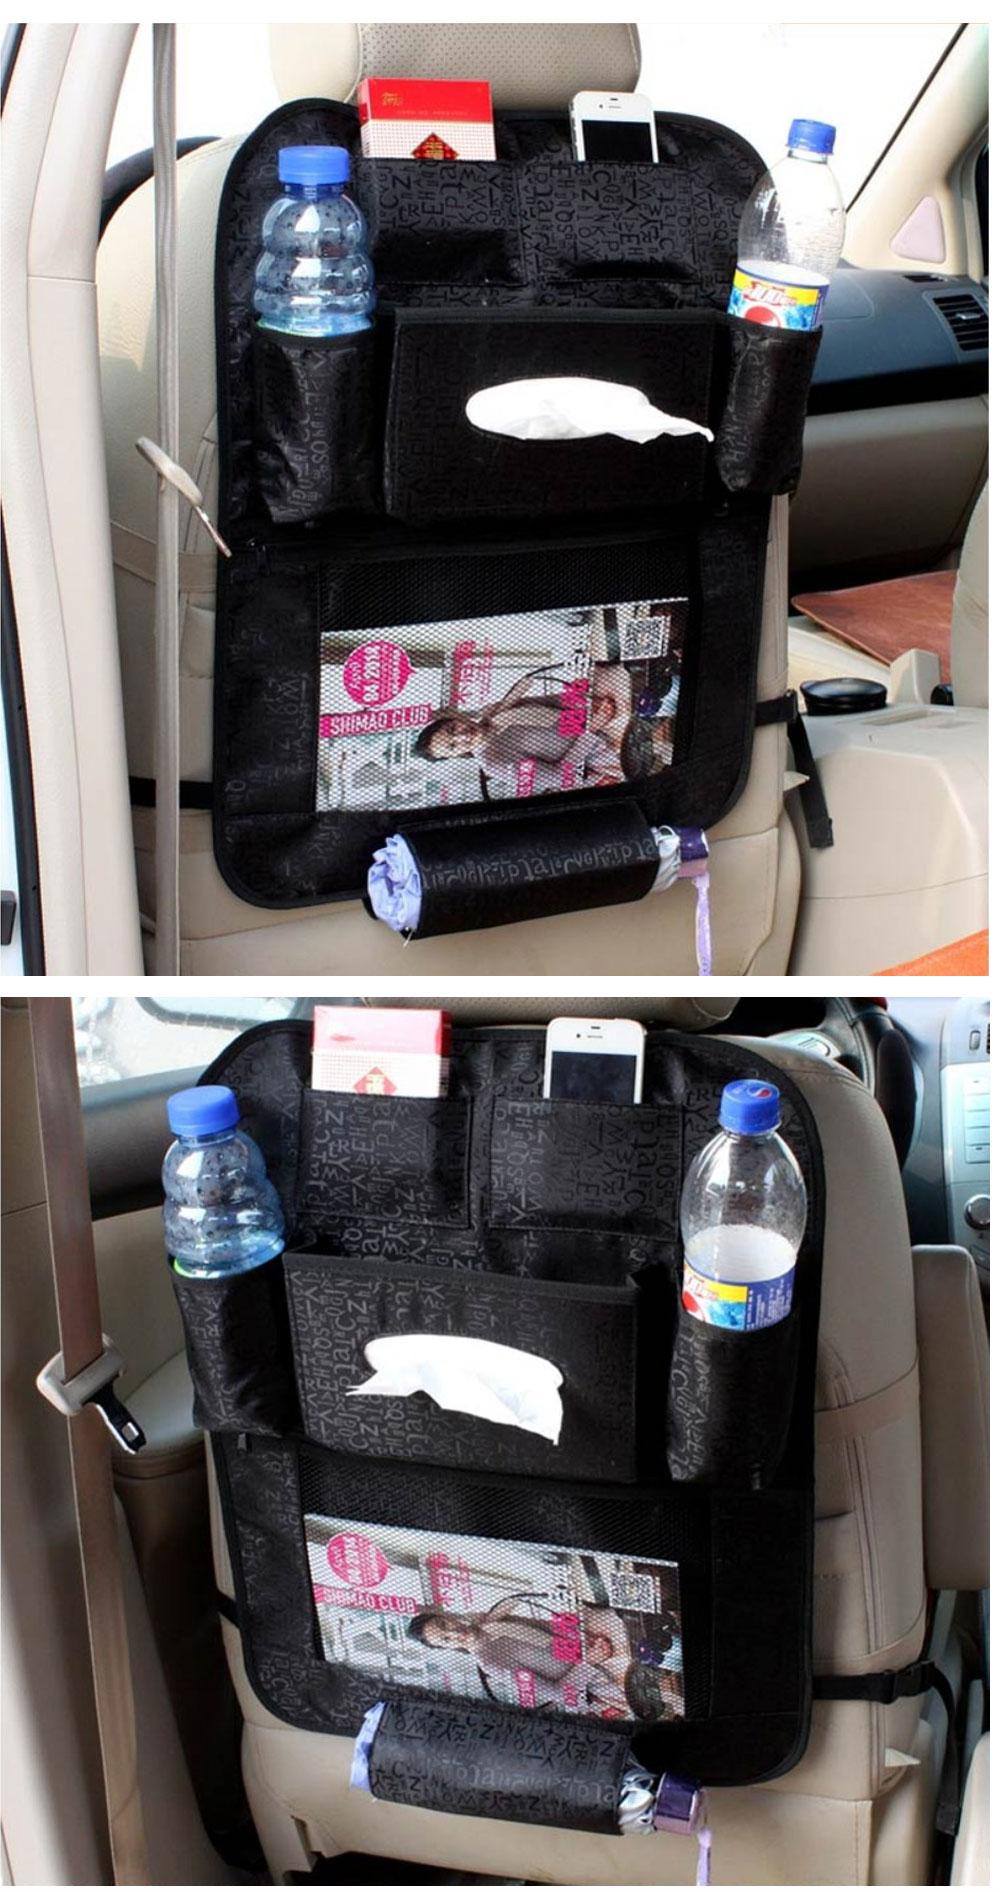 Car Organizer waterproof Car seat covers protector mat Car Storage Bags Seat Back Protector Case Cover Multi-Purpose 3